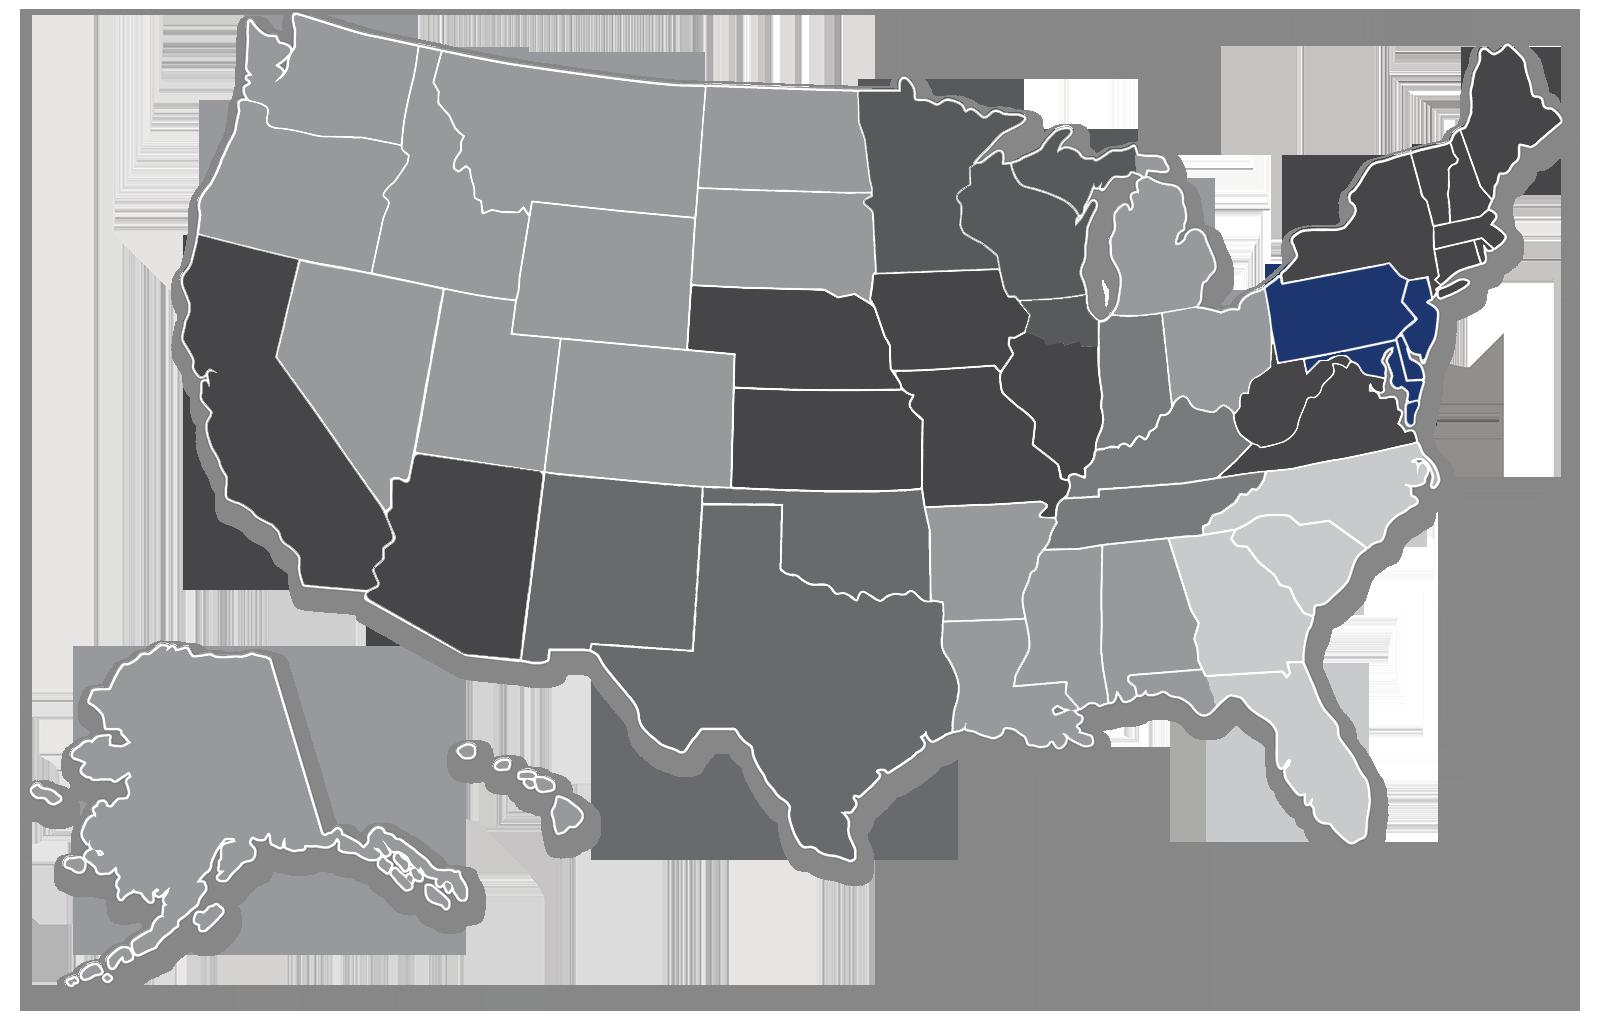 T15 - Mid-Atlantic Territory